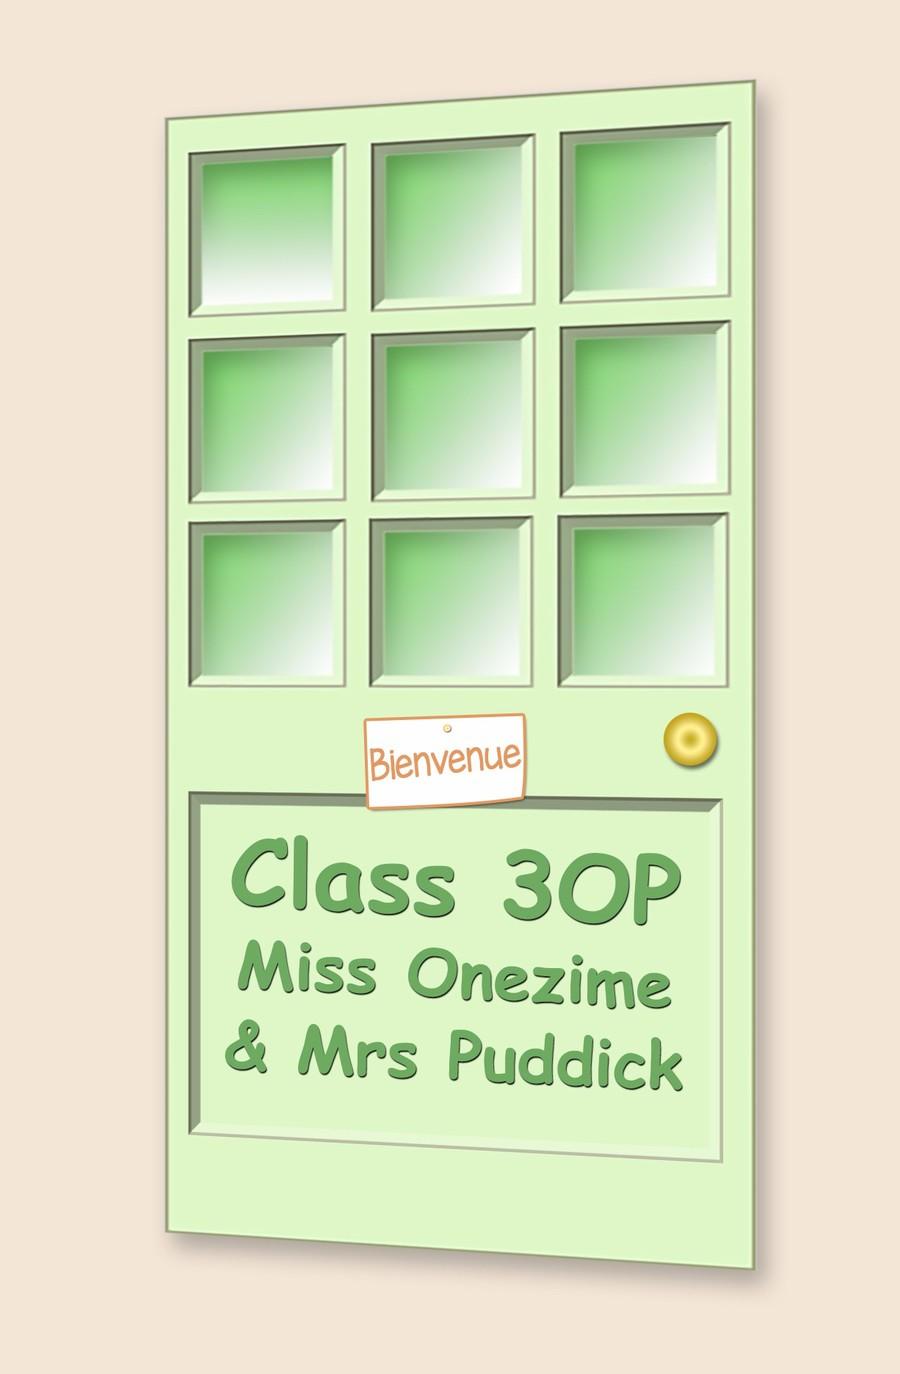 Go to Class 3OP